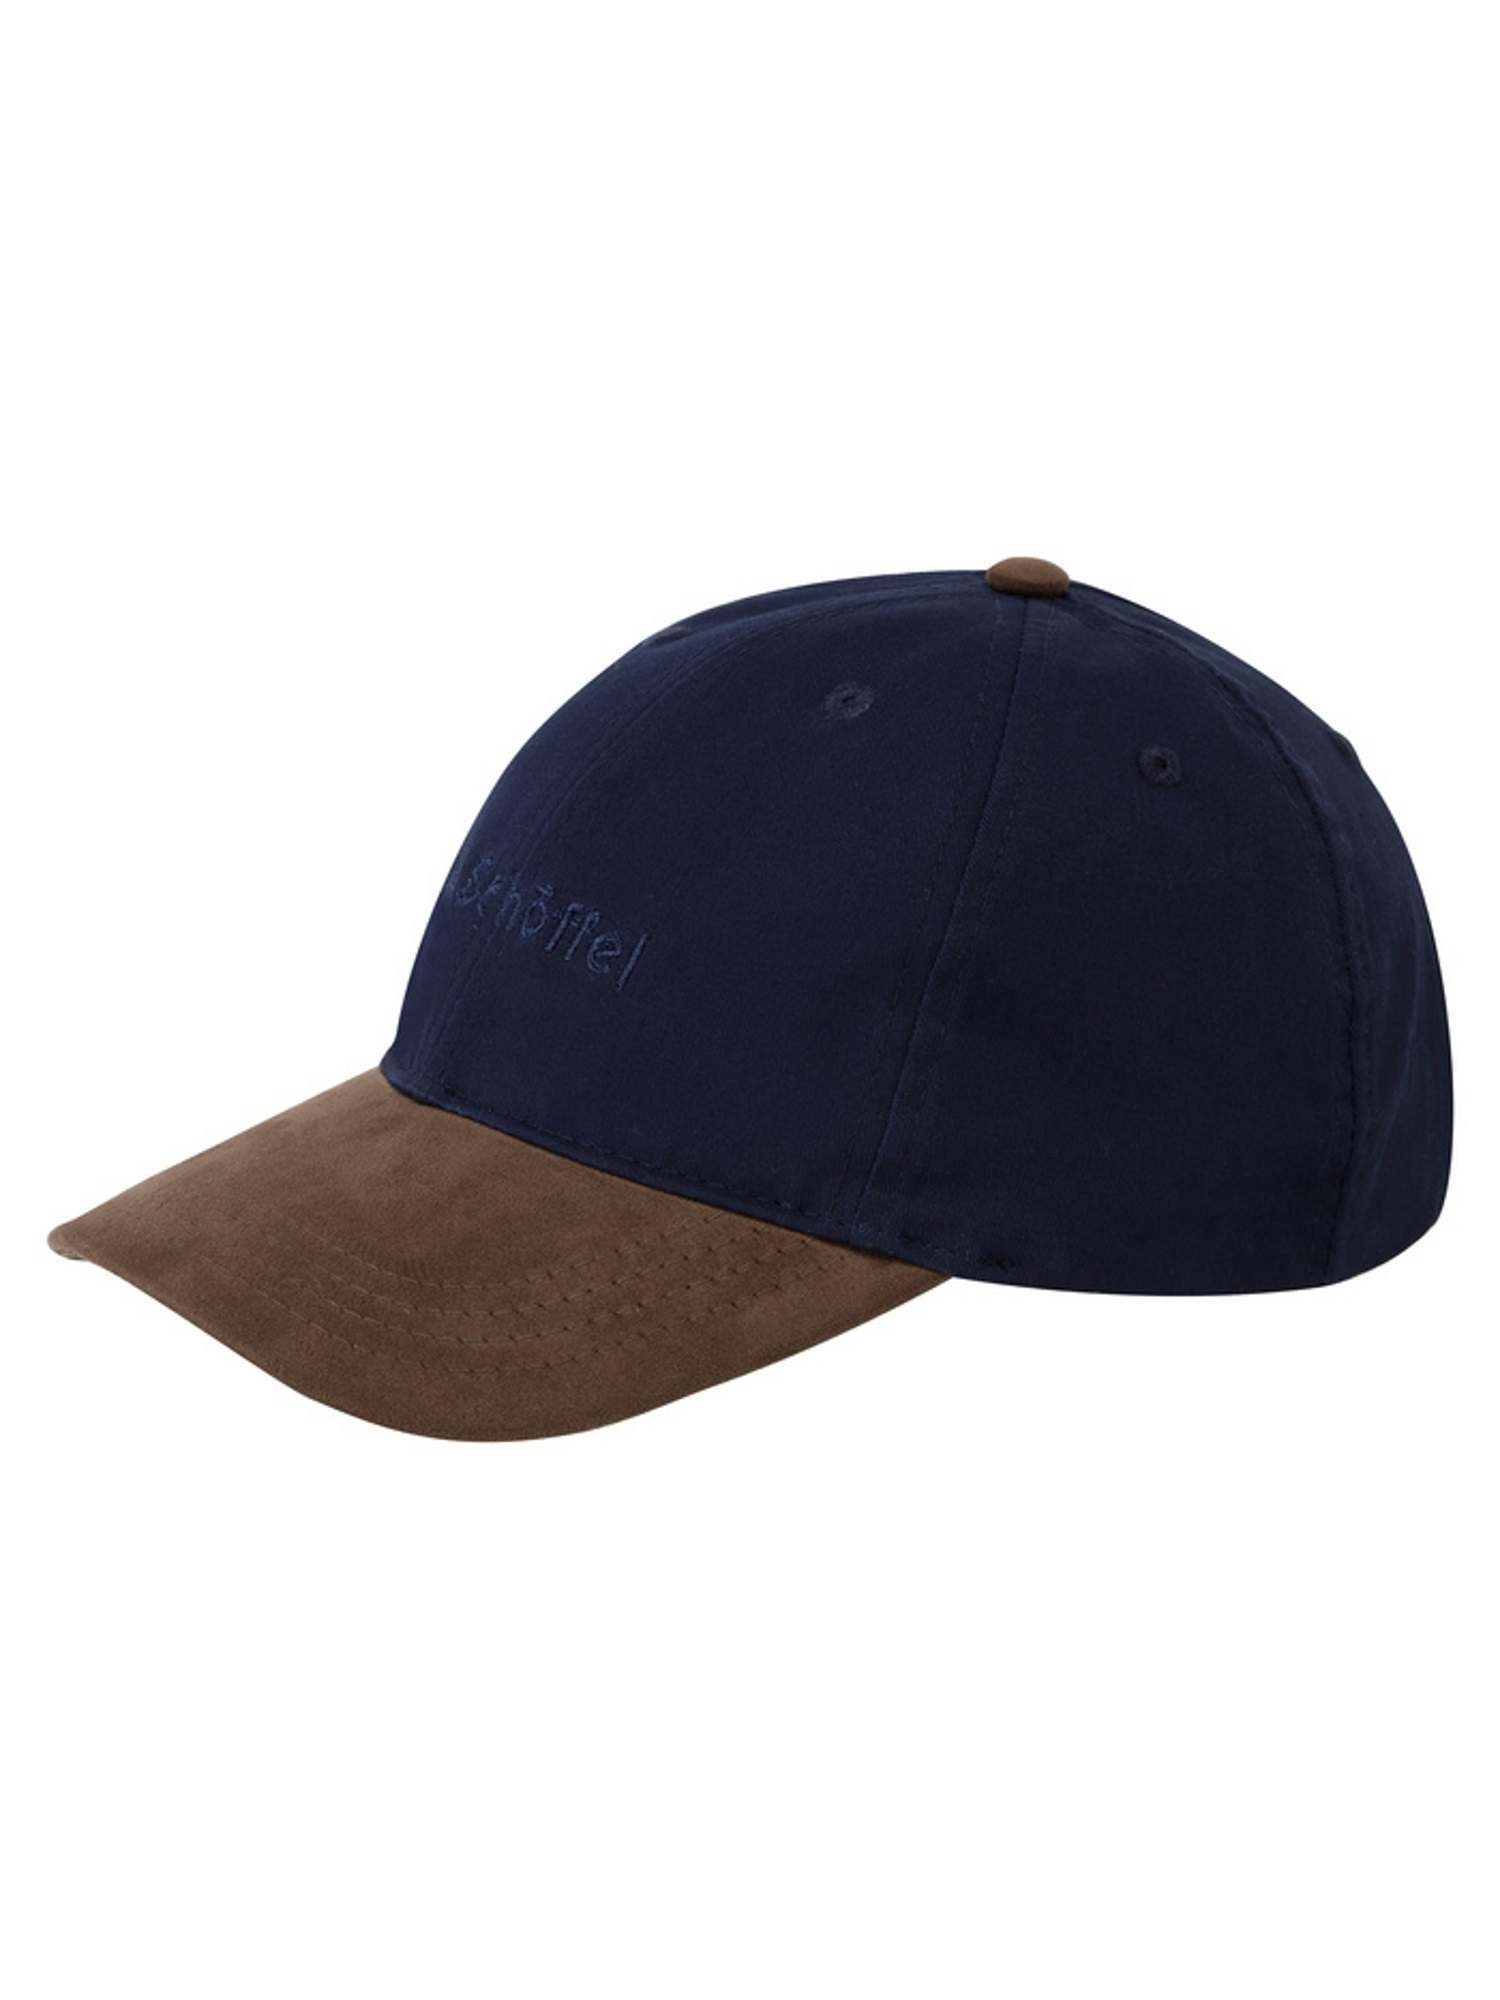 Schoffel Cowes Cap Navy 93ef9a050315